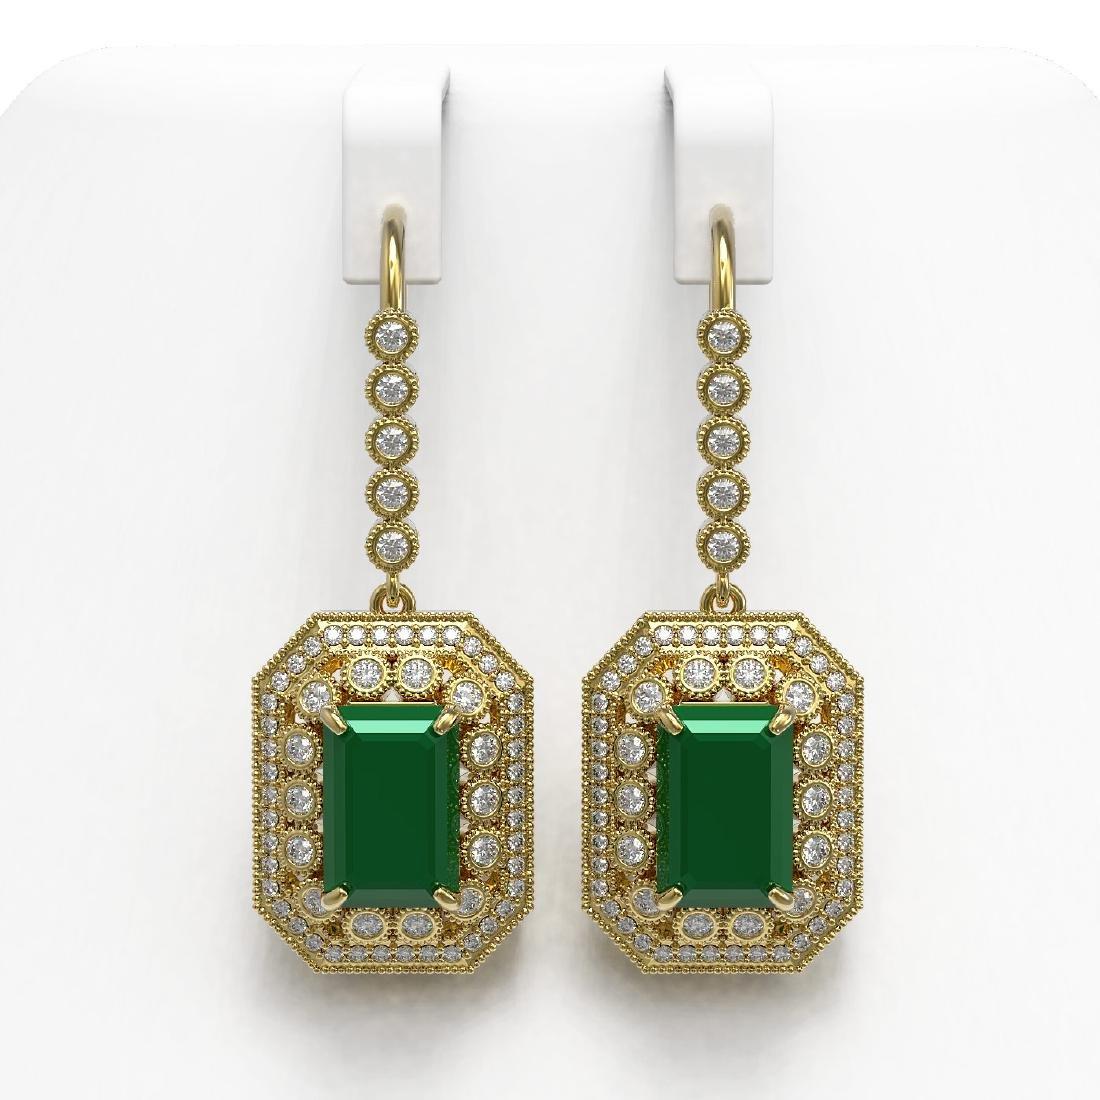 14.16 CTW Emerald & Diamond Earrings 14K Yellow Gold -